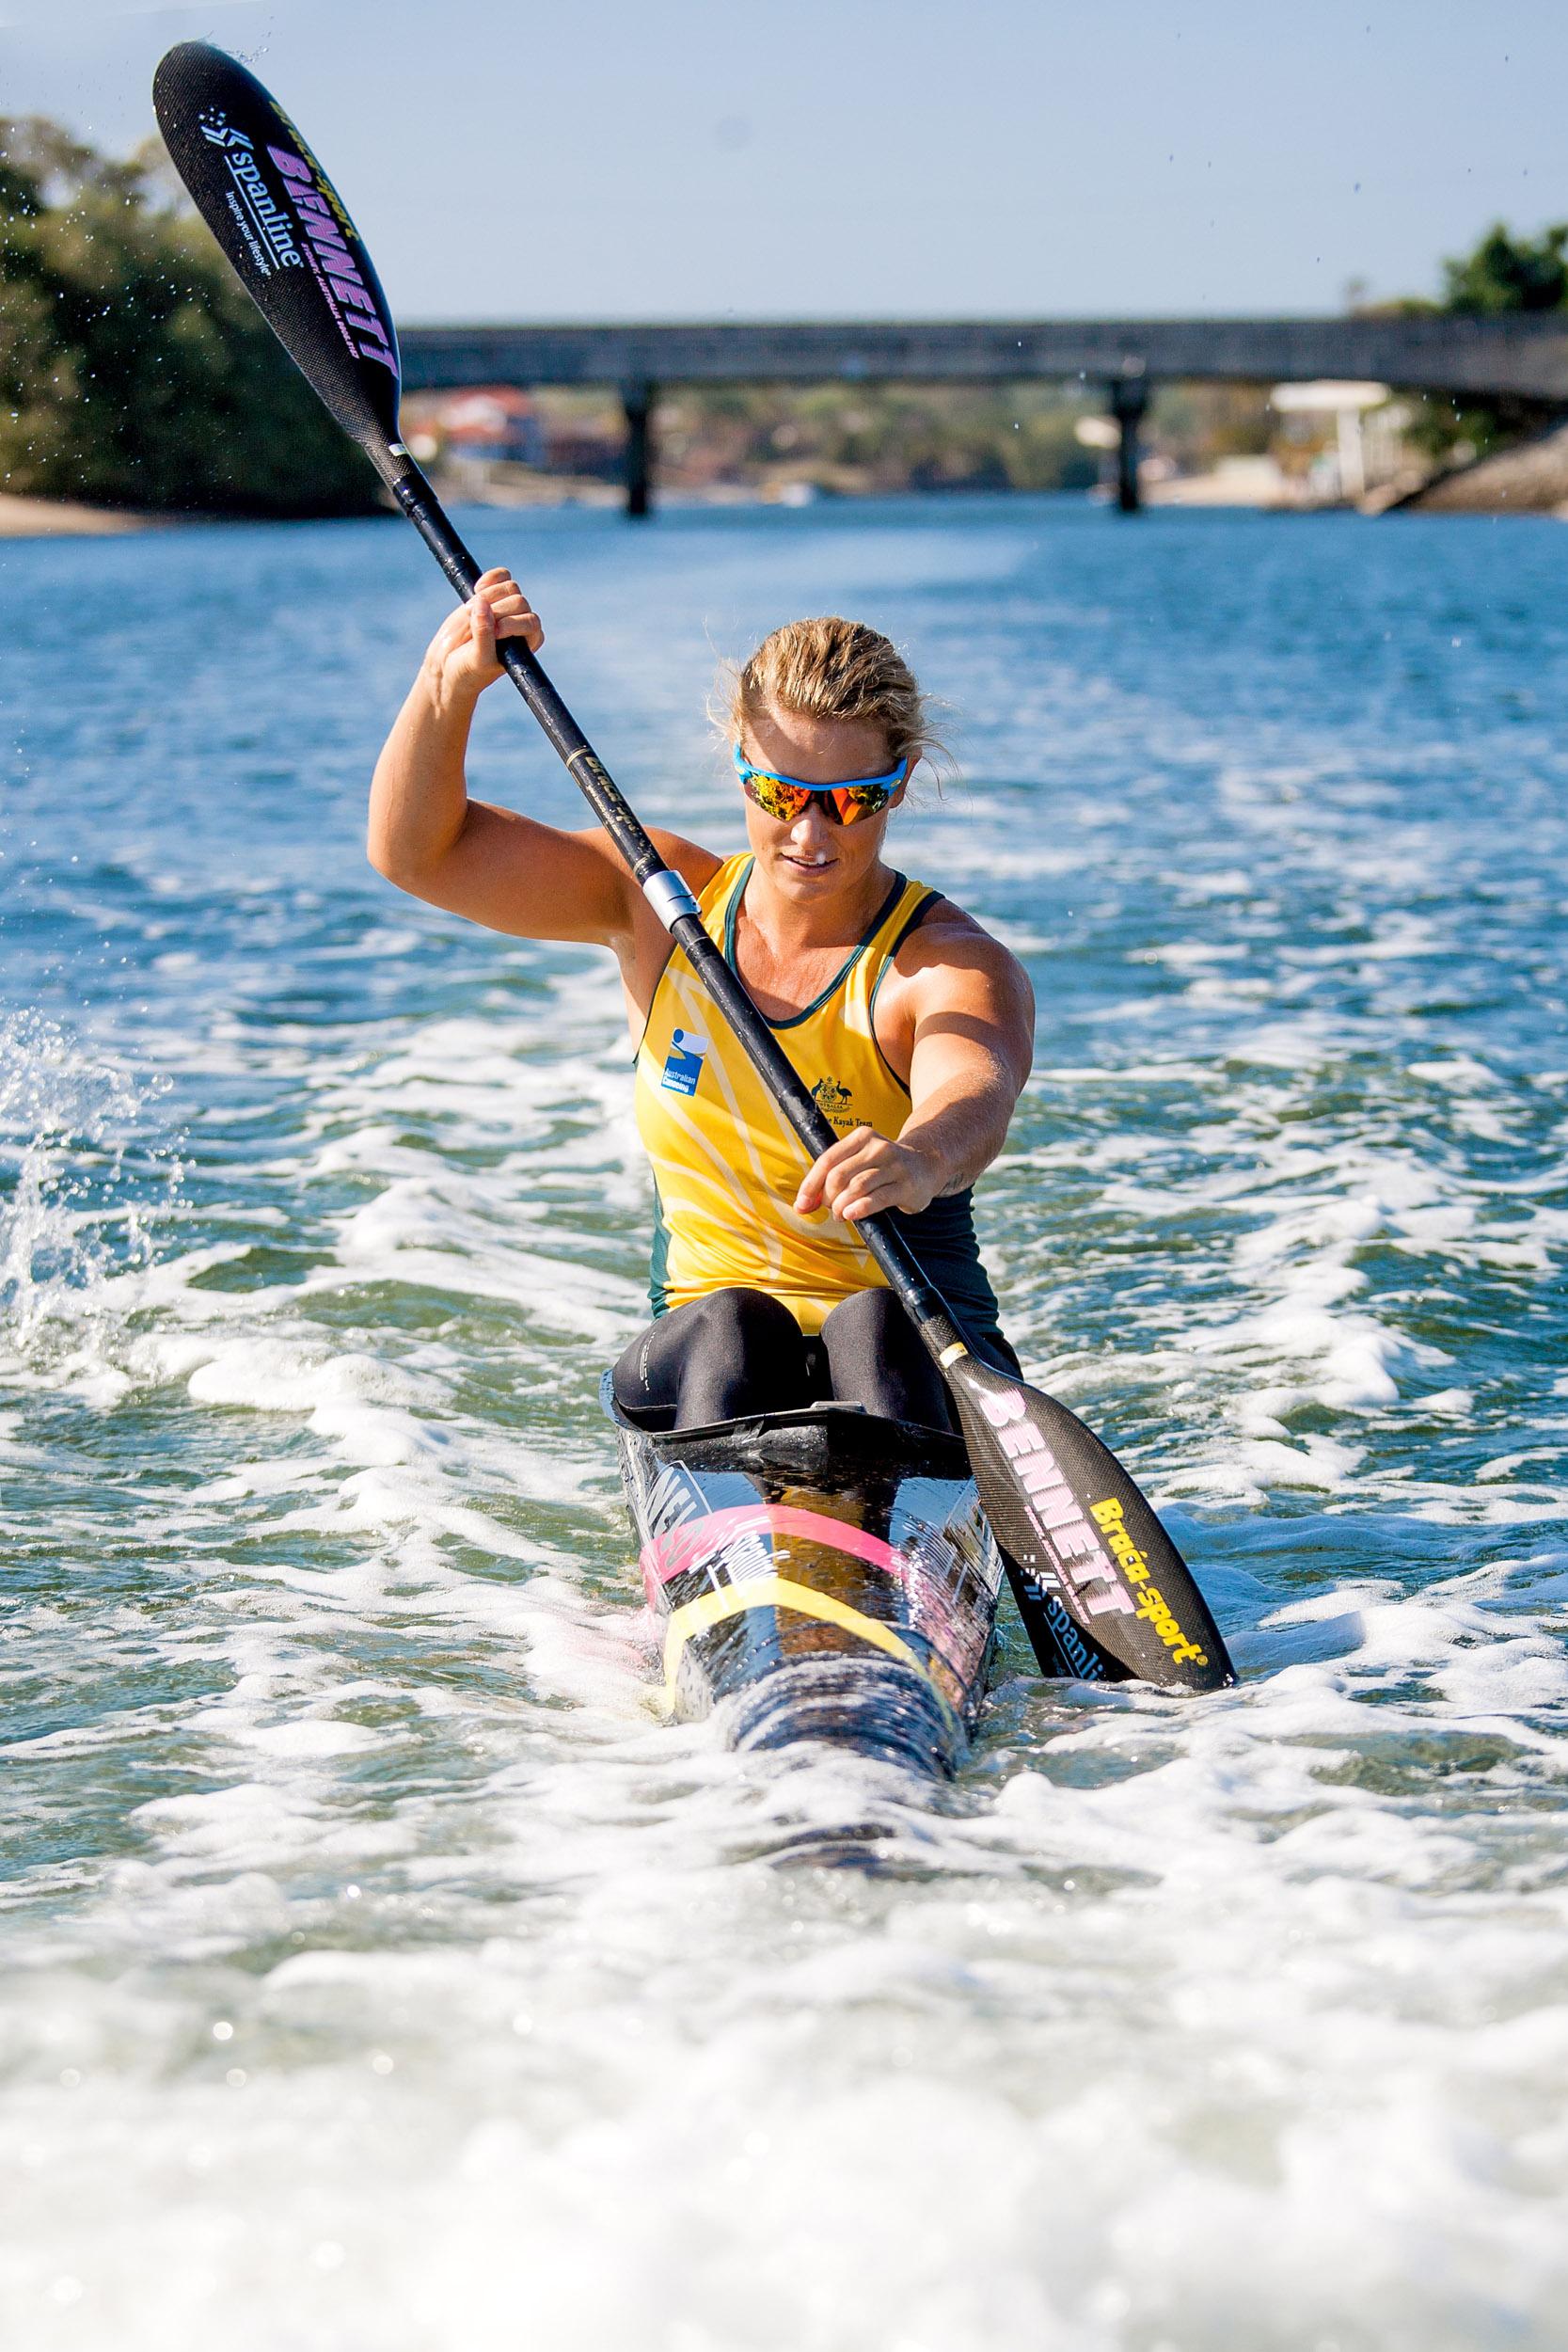 kayak-olympian-photography.jpg